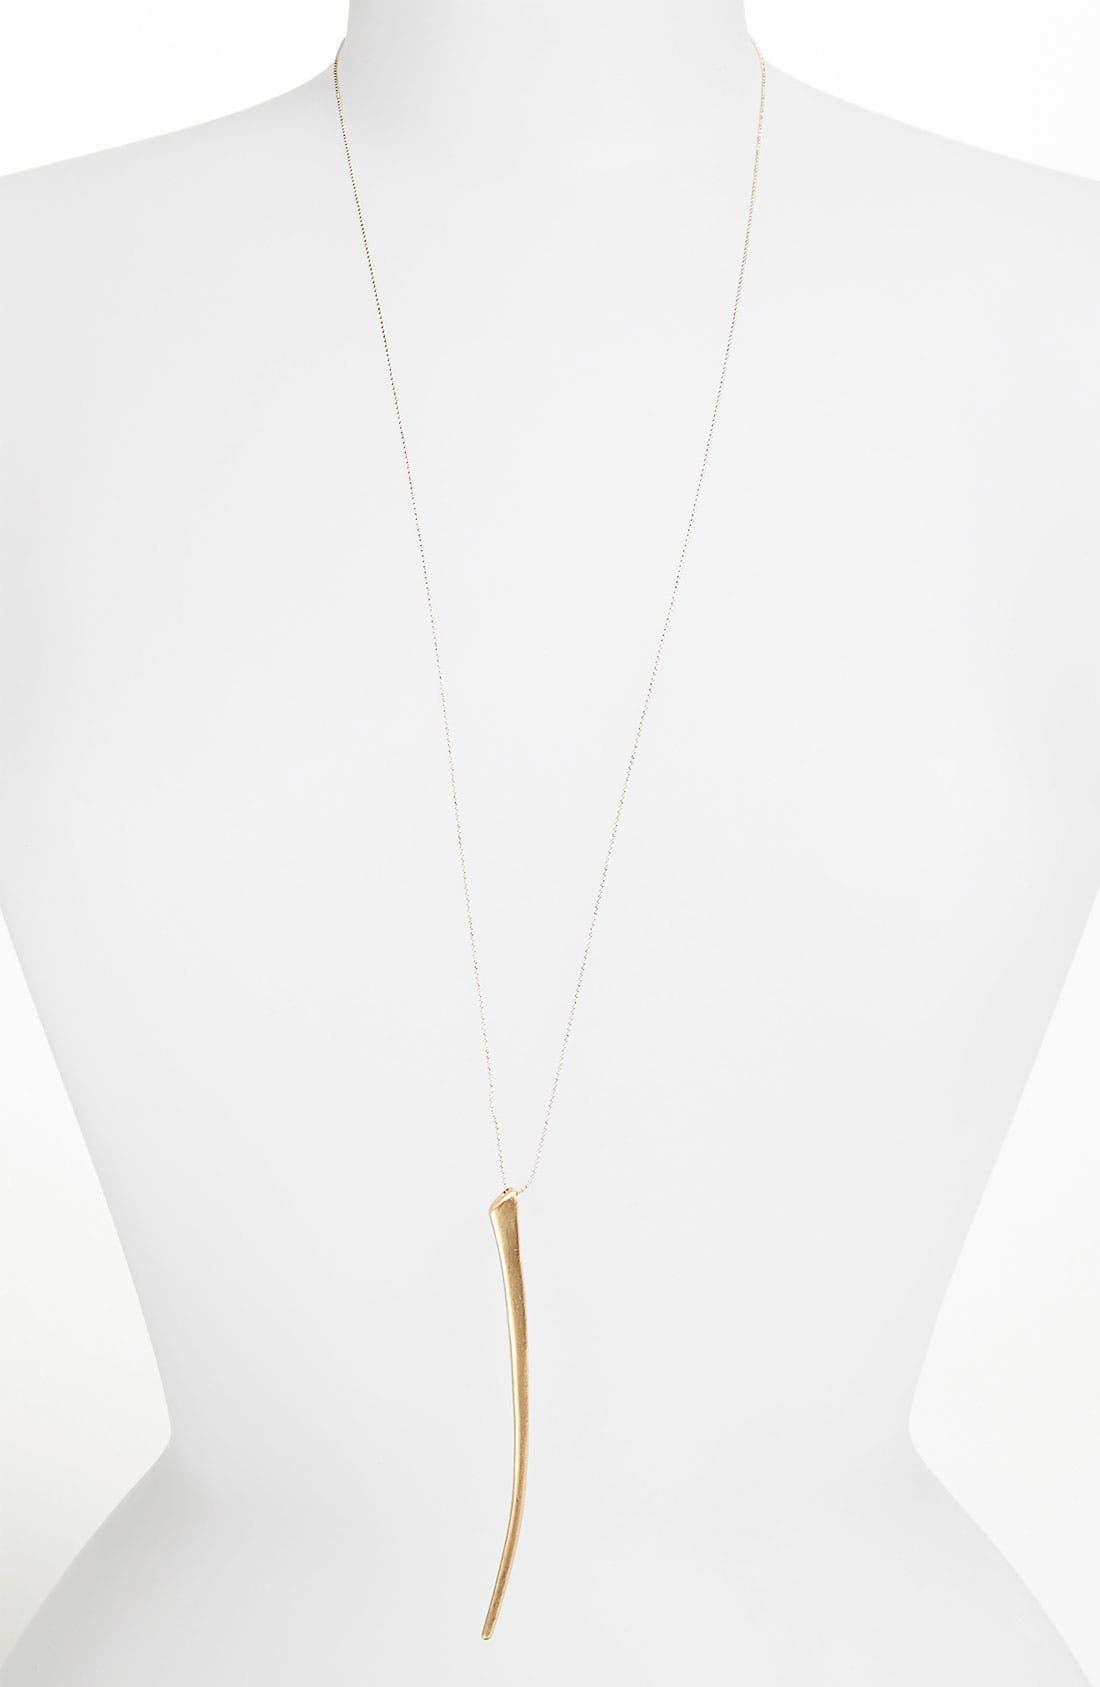 Main Image - Topshop 'Thin Tusk' Pendant Necklace